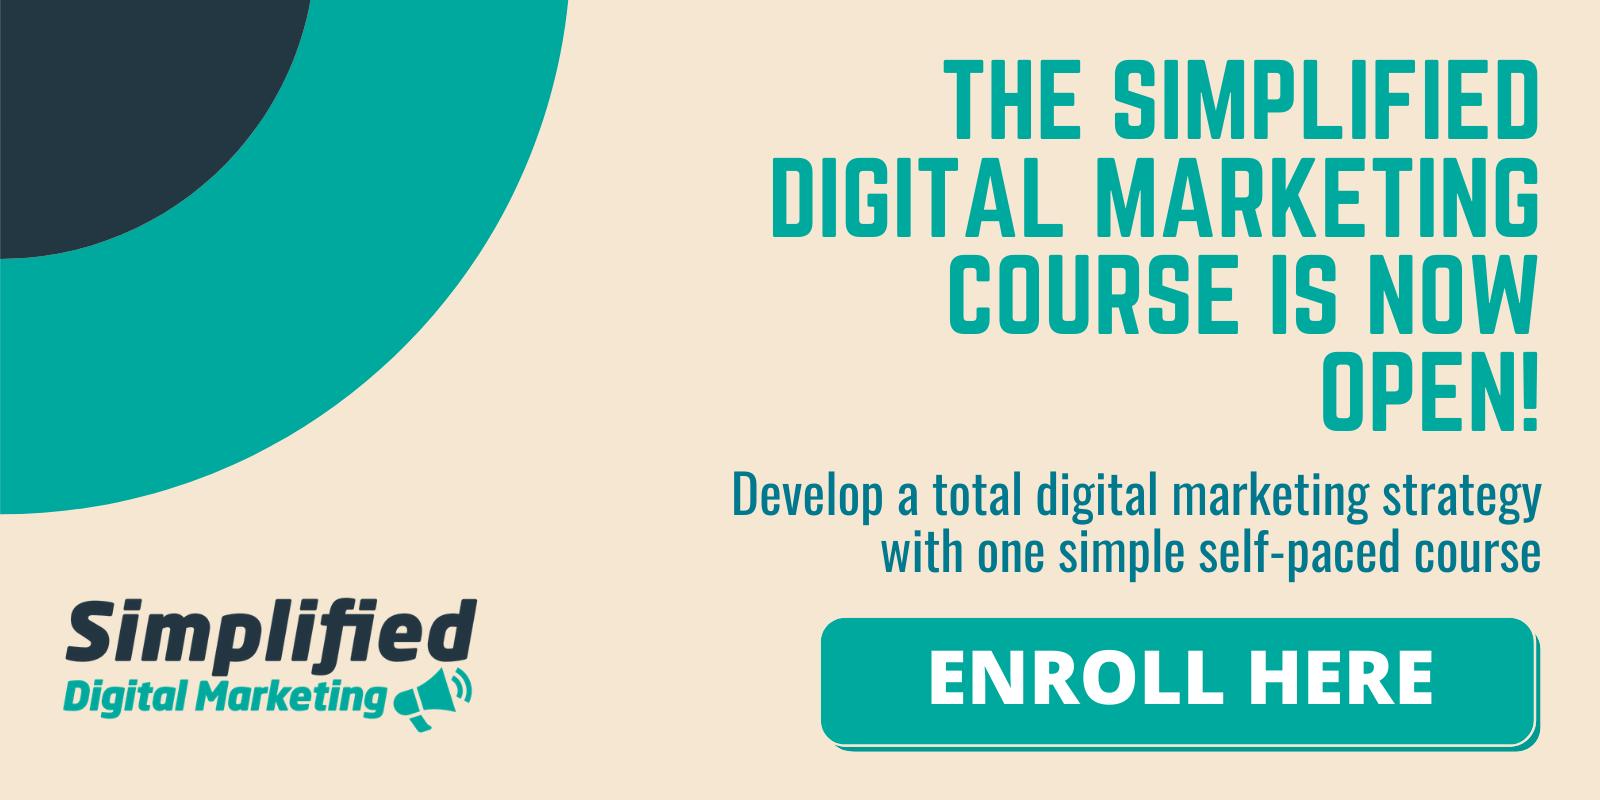 simplified digital marketing course enroll here